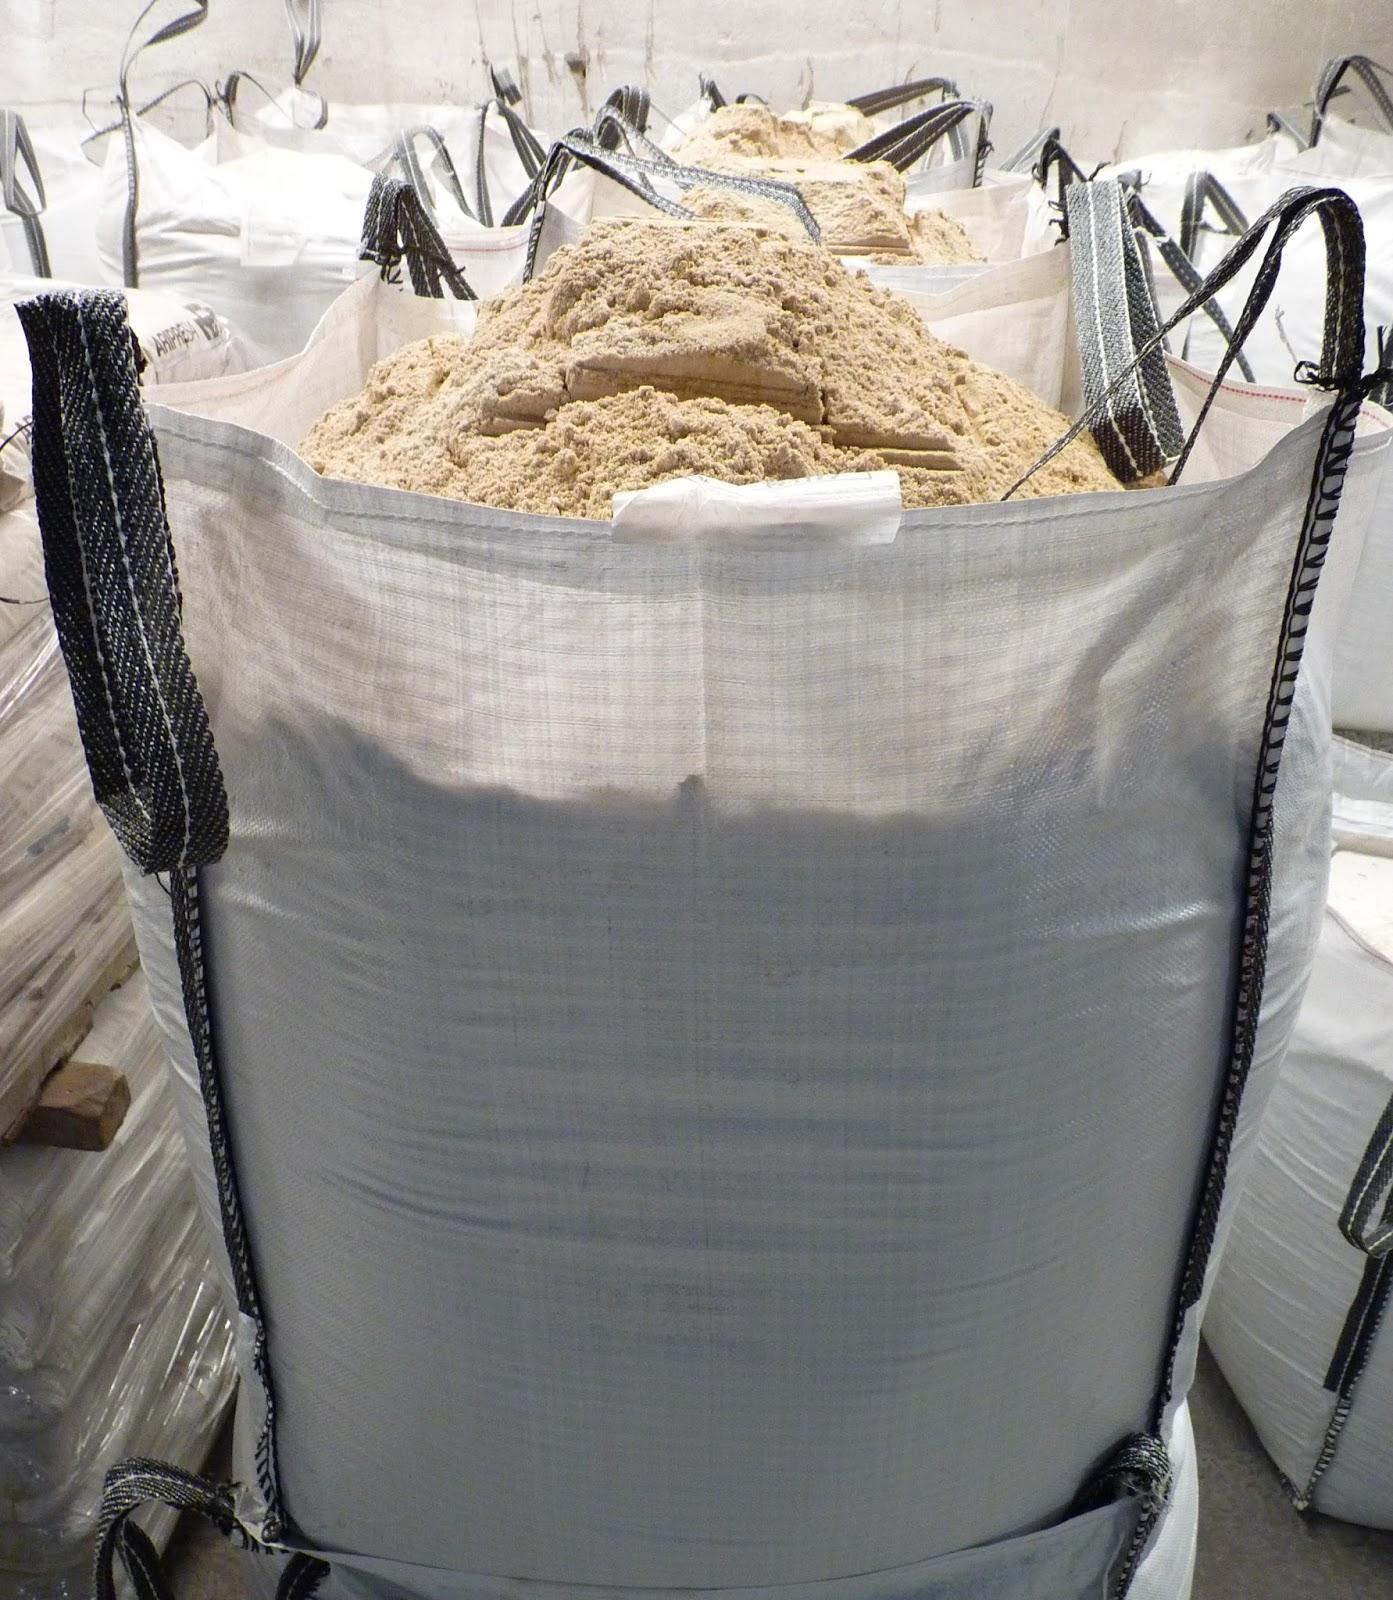 Precio saco de mortero beautiful interesting revolvedora - Precio de saco de cemento gris ...